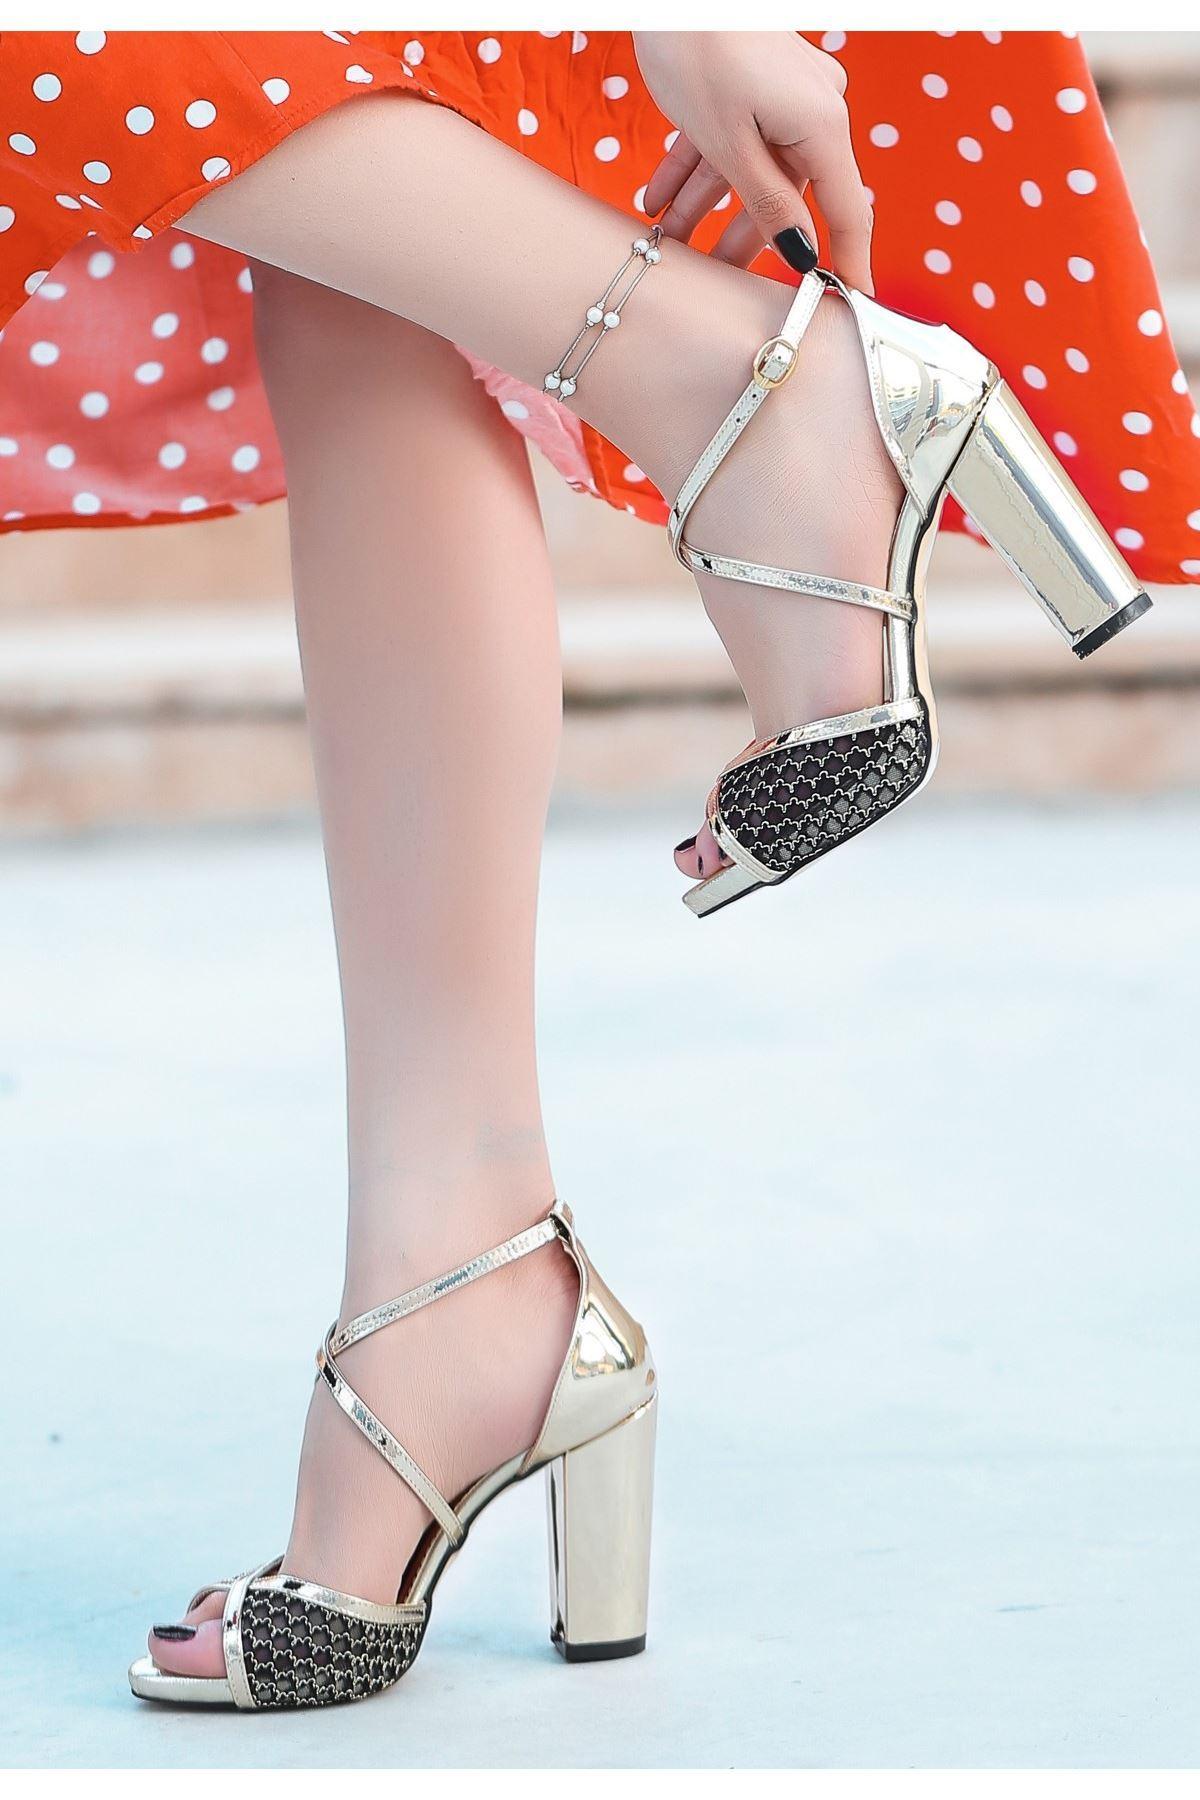 Gend Gold Rugan Dantelli Topuklu Ayakkabı